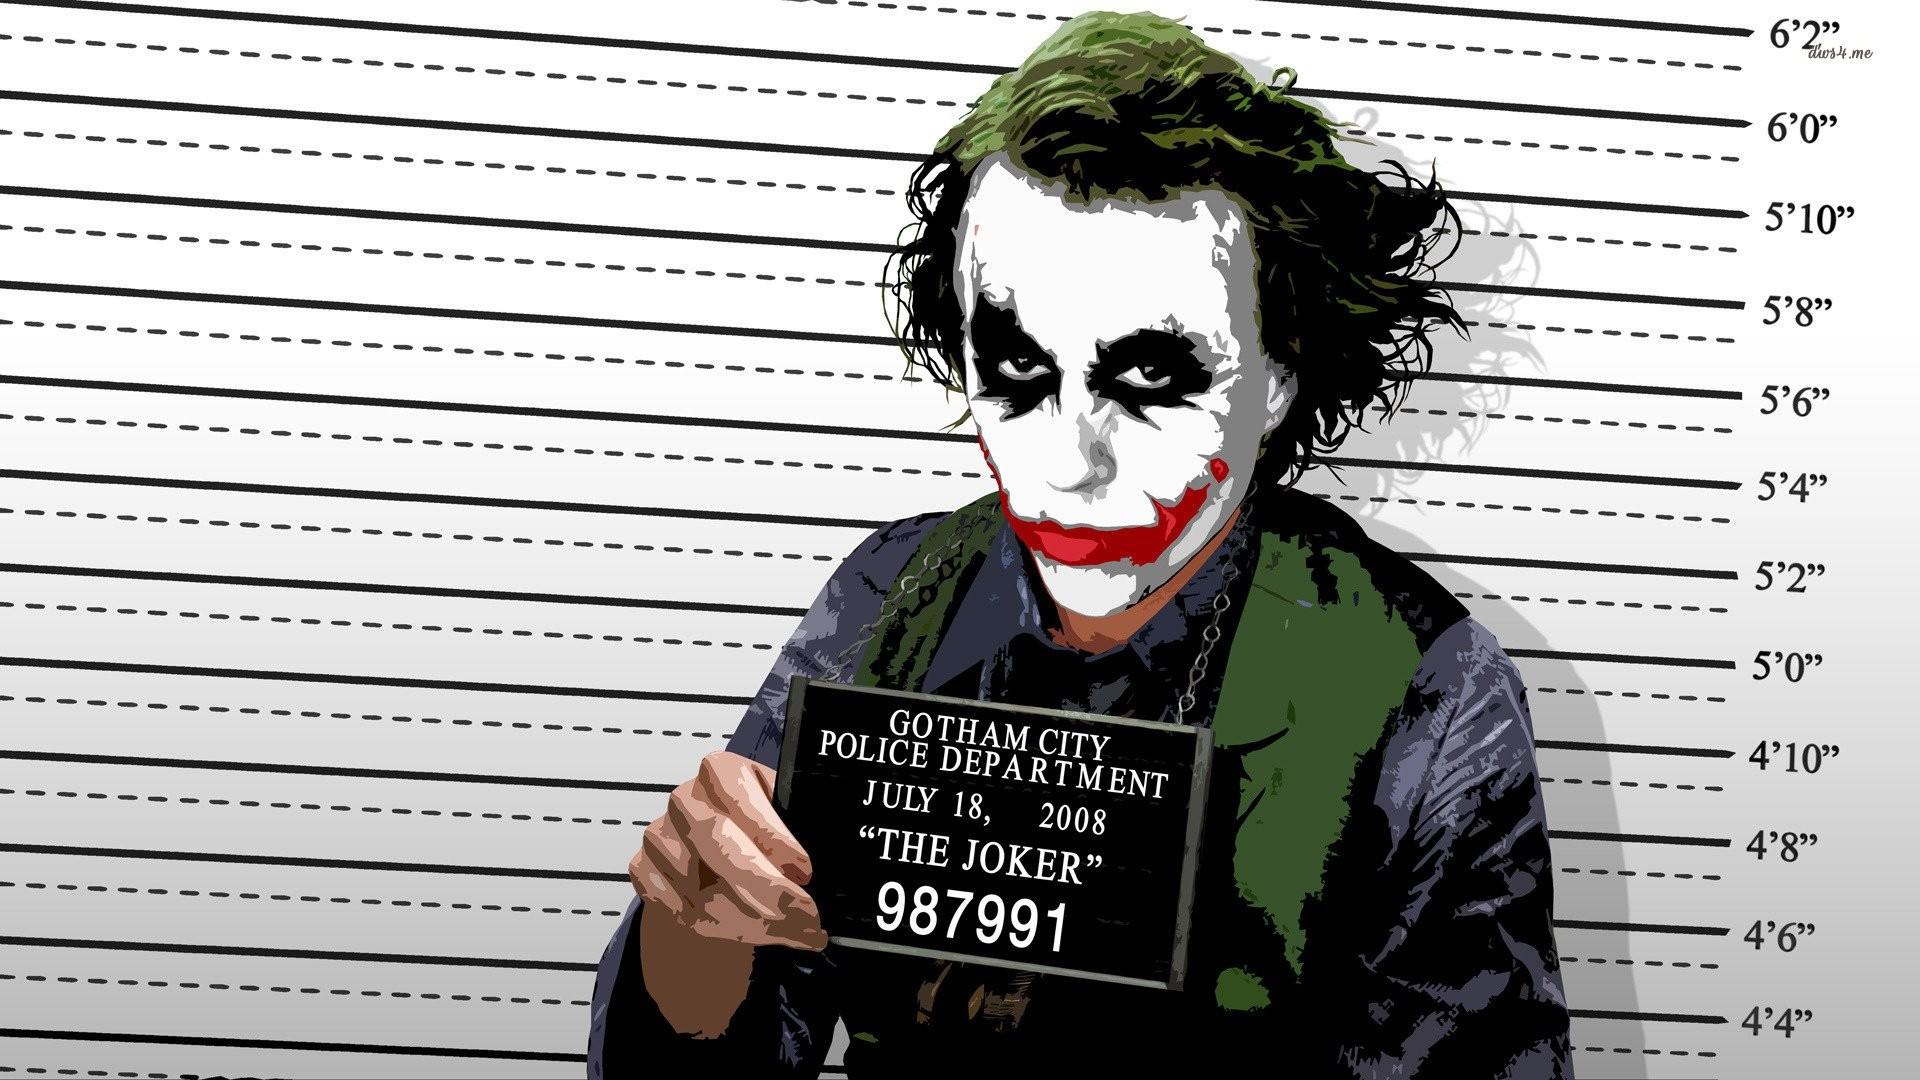 Fond Décran Illustration Joker Dessin Animé Marque